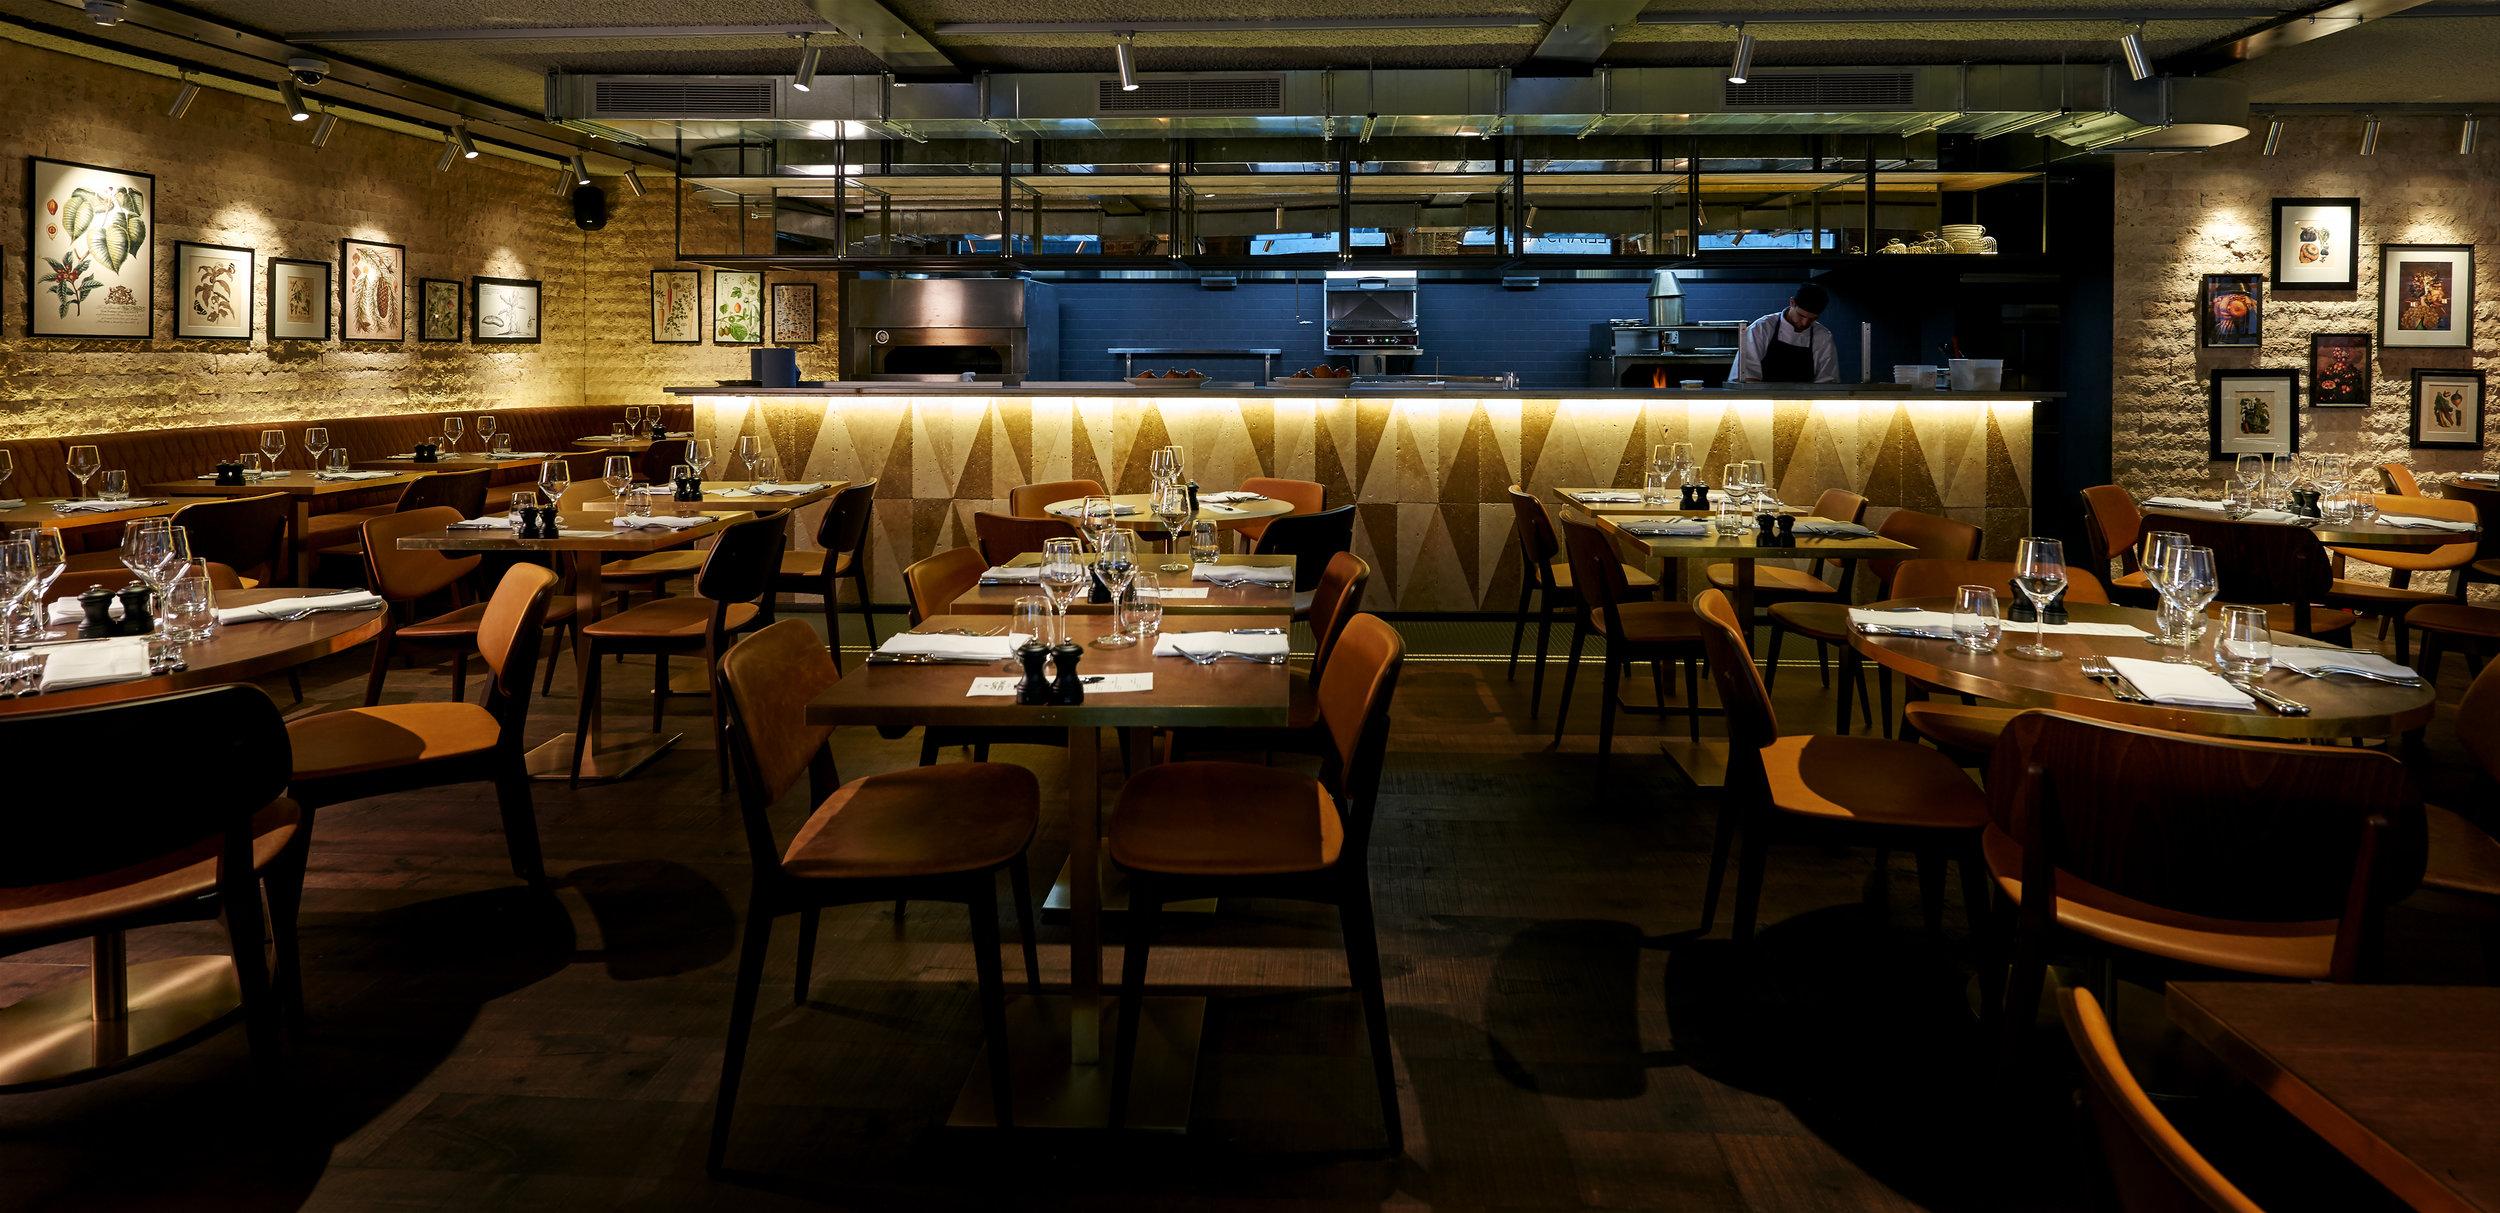 Canto Main Dining Room 1 2.jpg